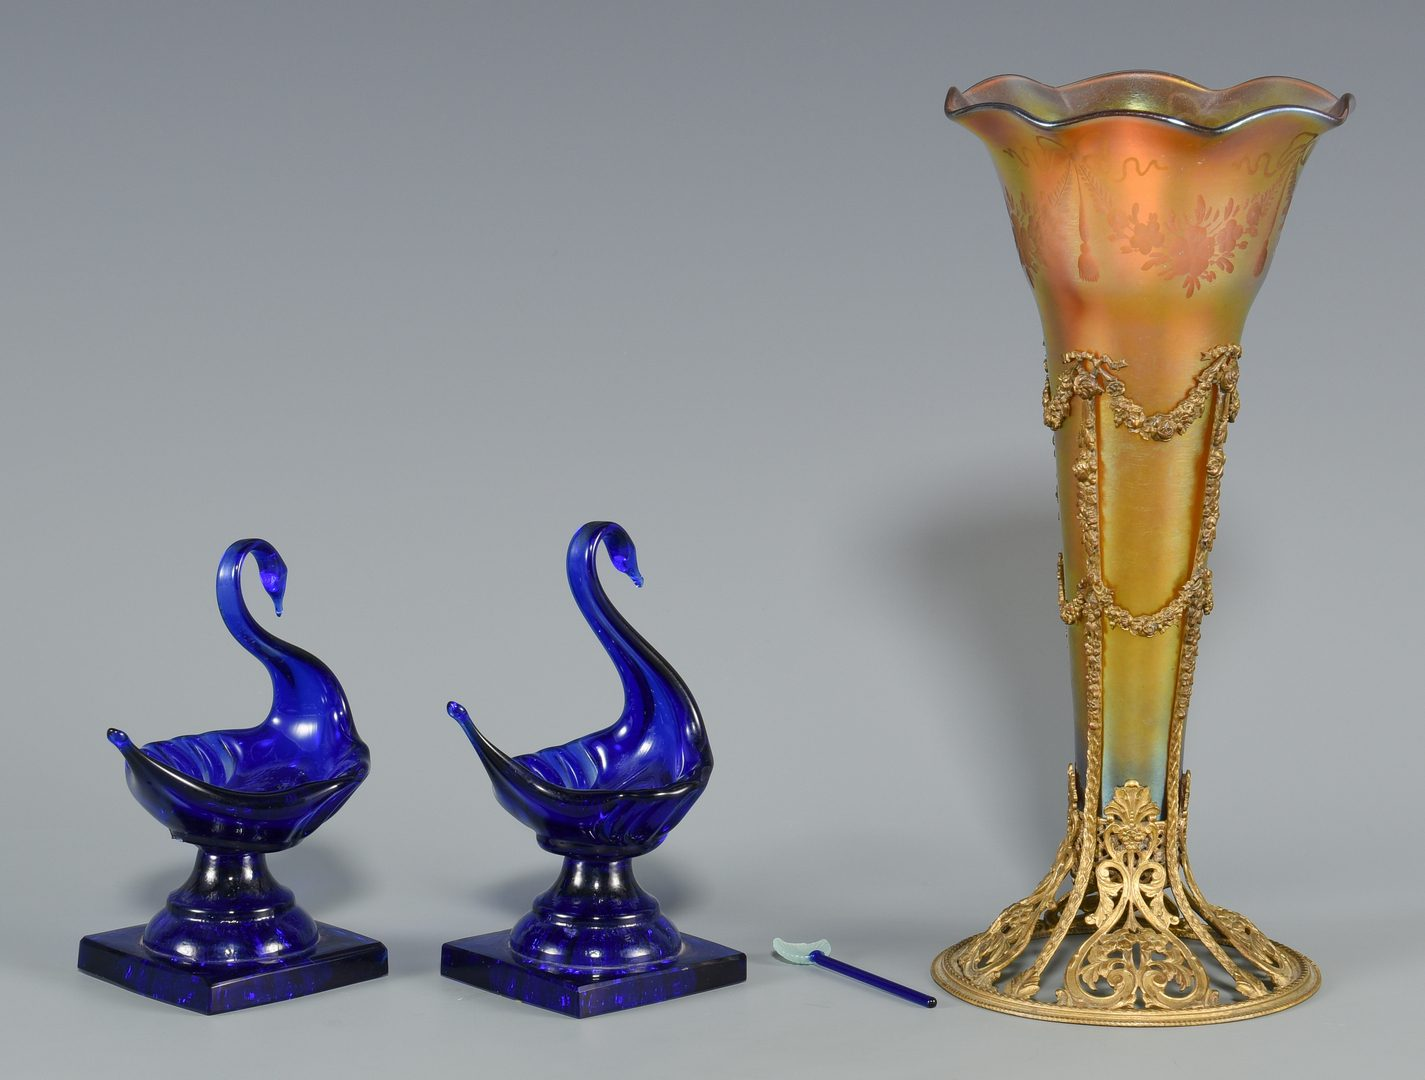 Lot 520: Bronze Mounted Art Glass Vase & 2 Cobalt Glass Swan Salts, 4 items